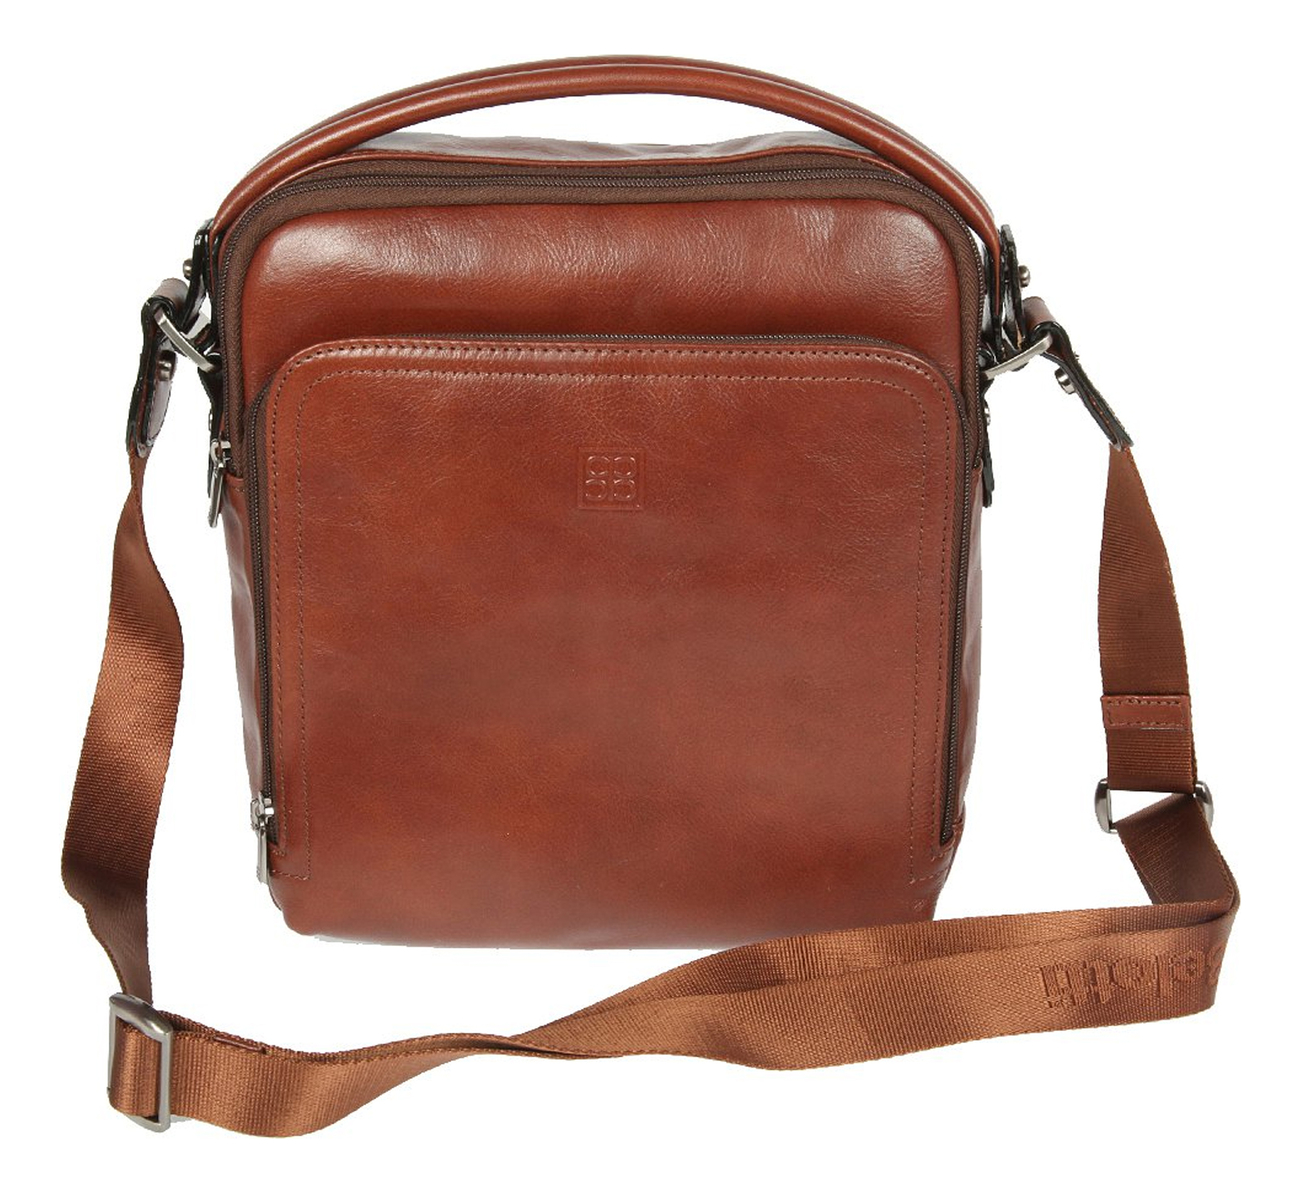 Купить Планшет Milano Brown 9188 (коричневый), Sergio Belotti